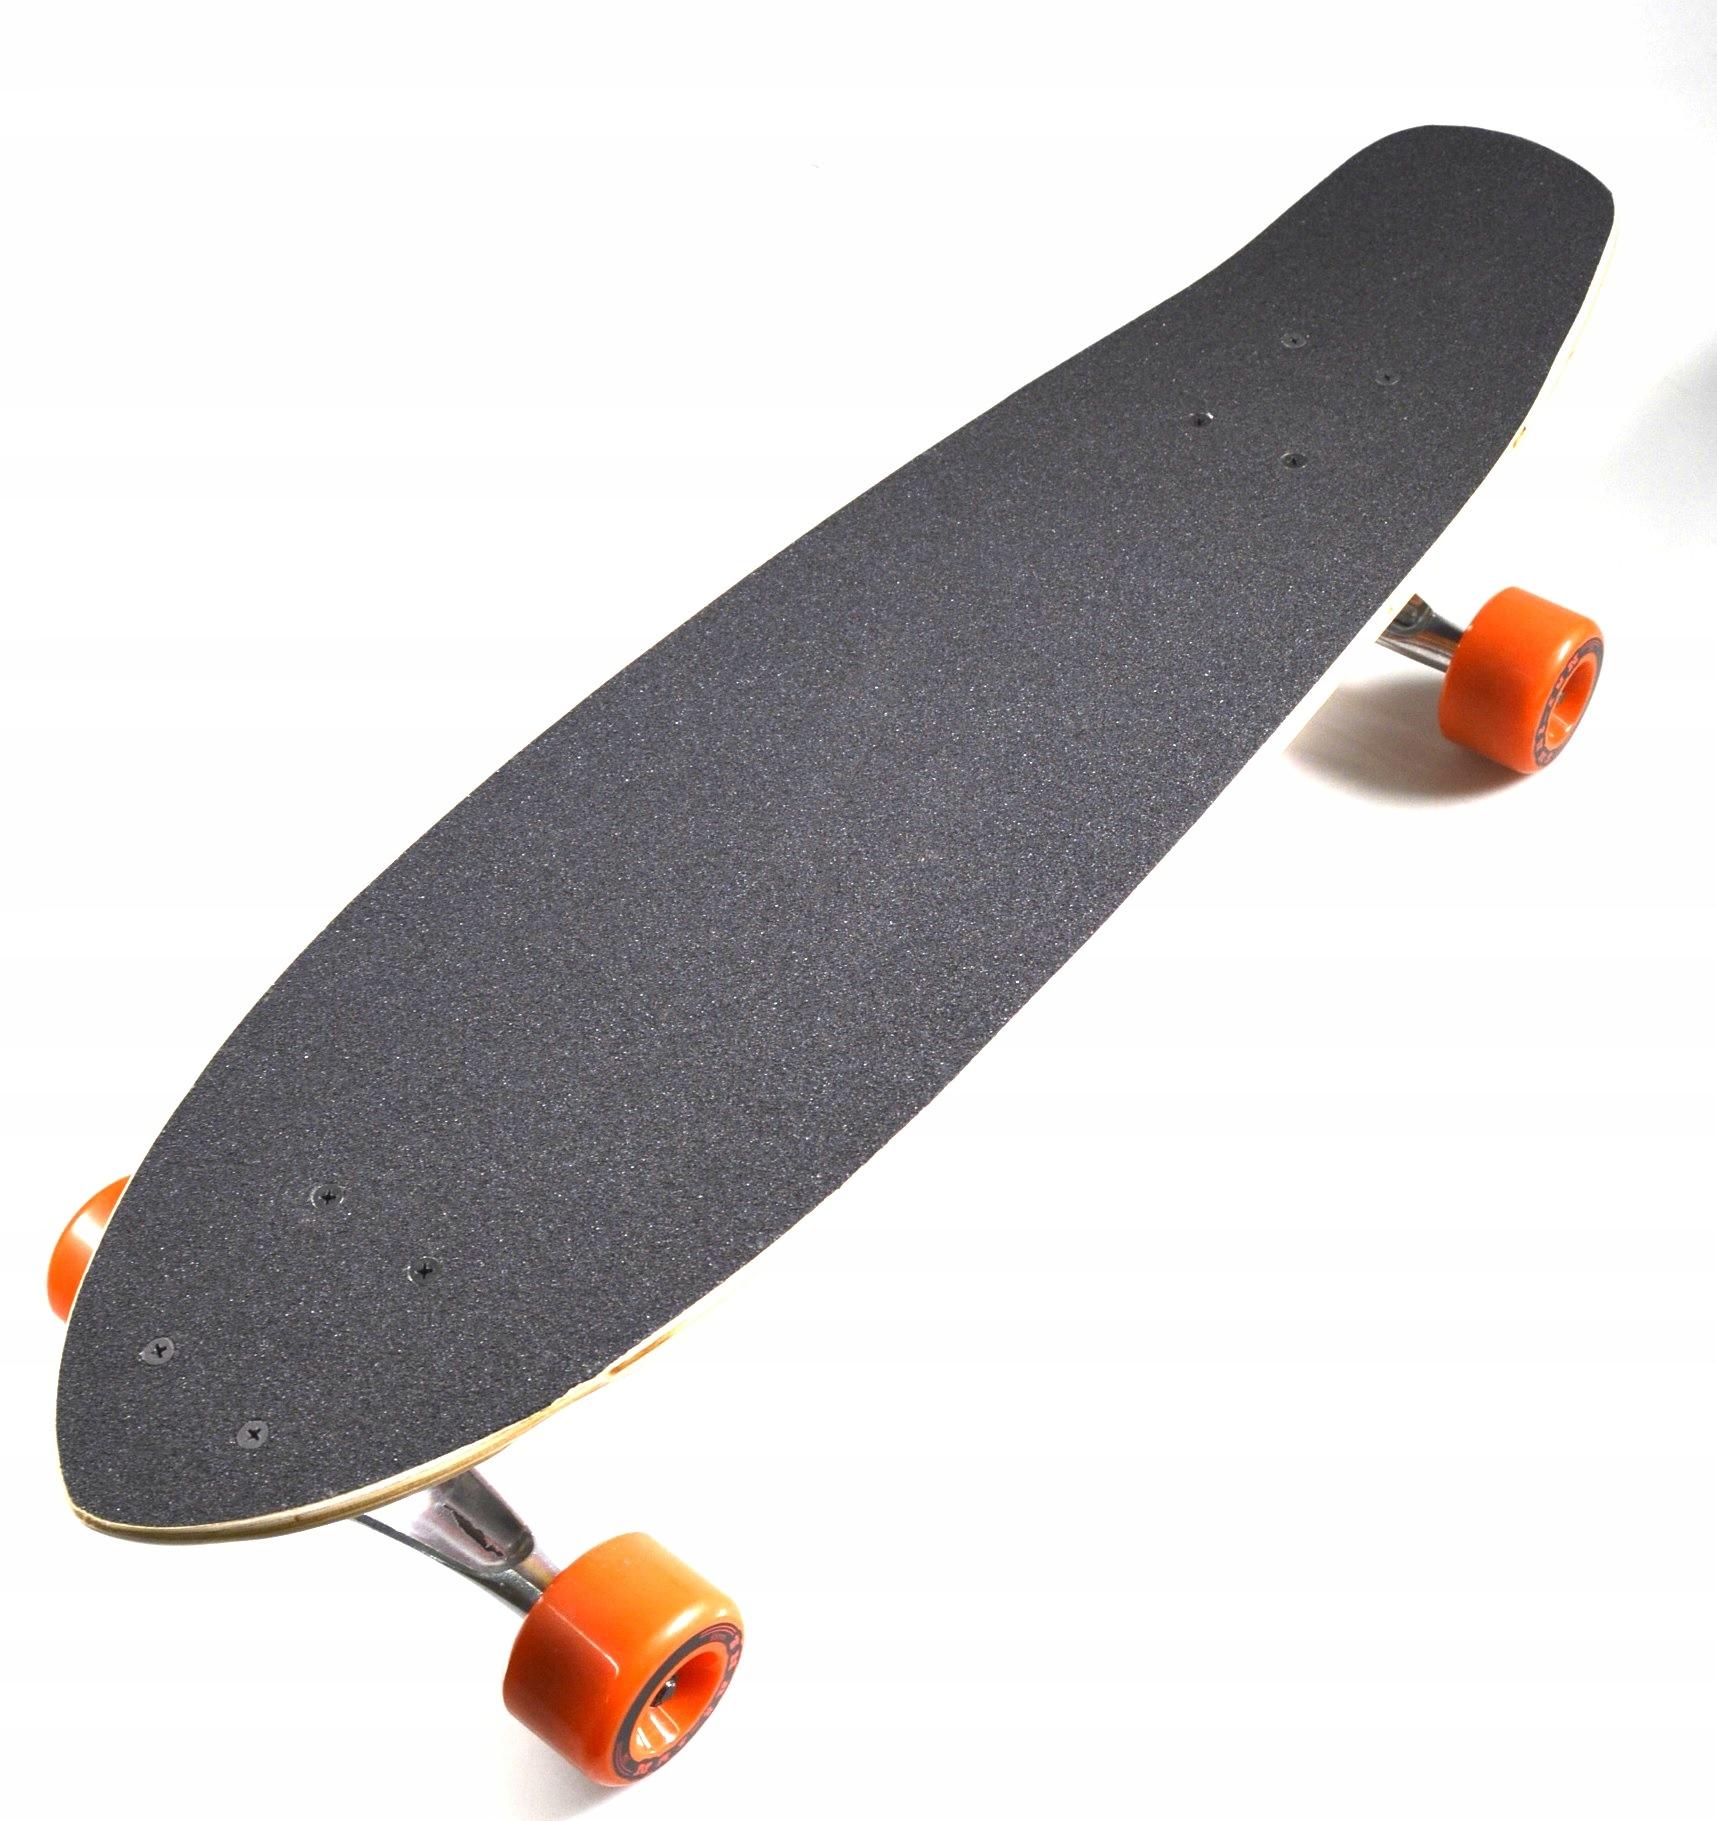 Longboard Skateboard 74cm ABEC 7 až 100 kg